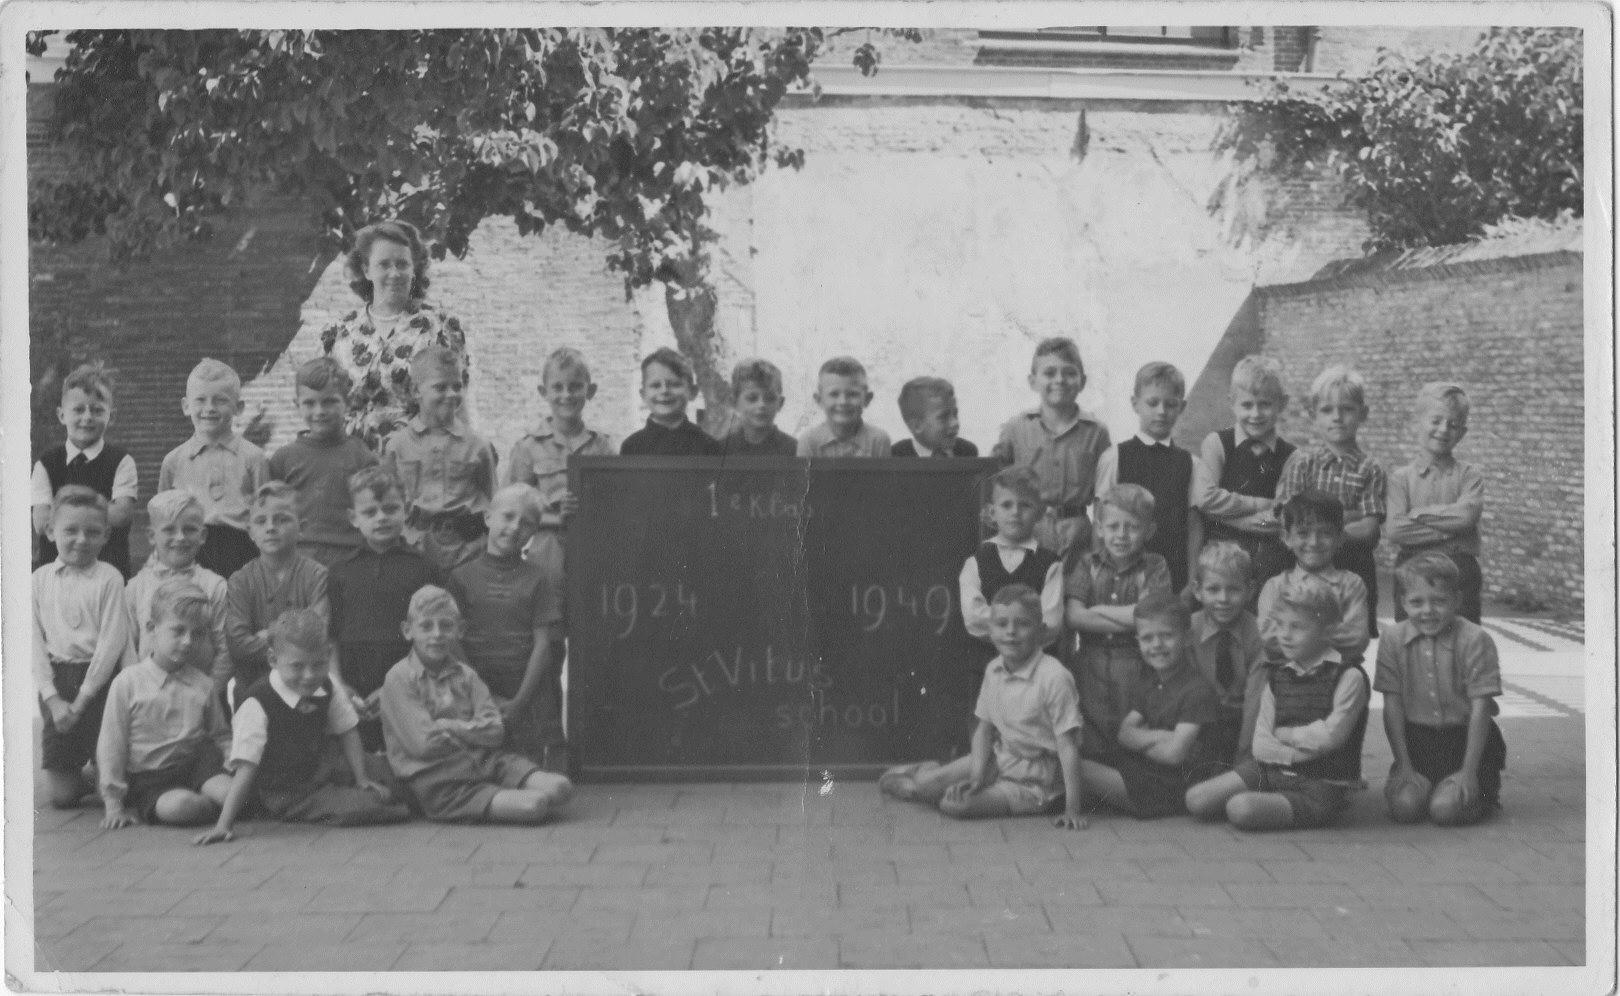 R K St Vitus school foto